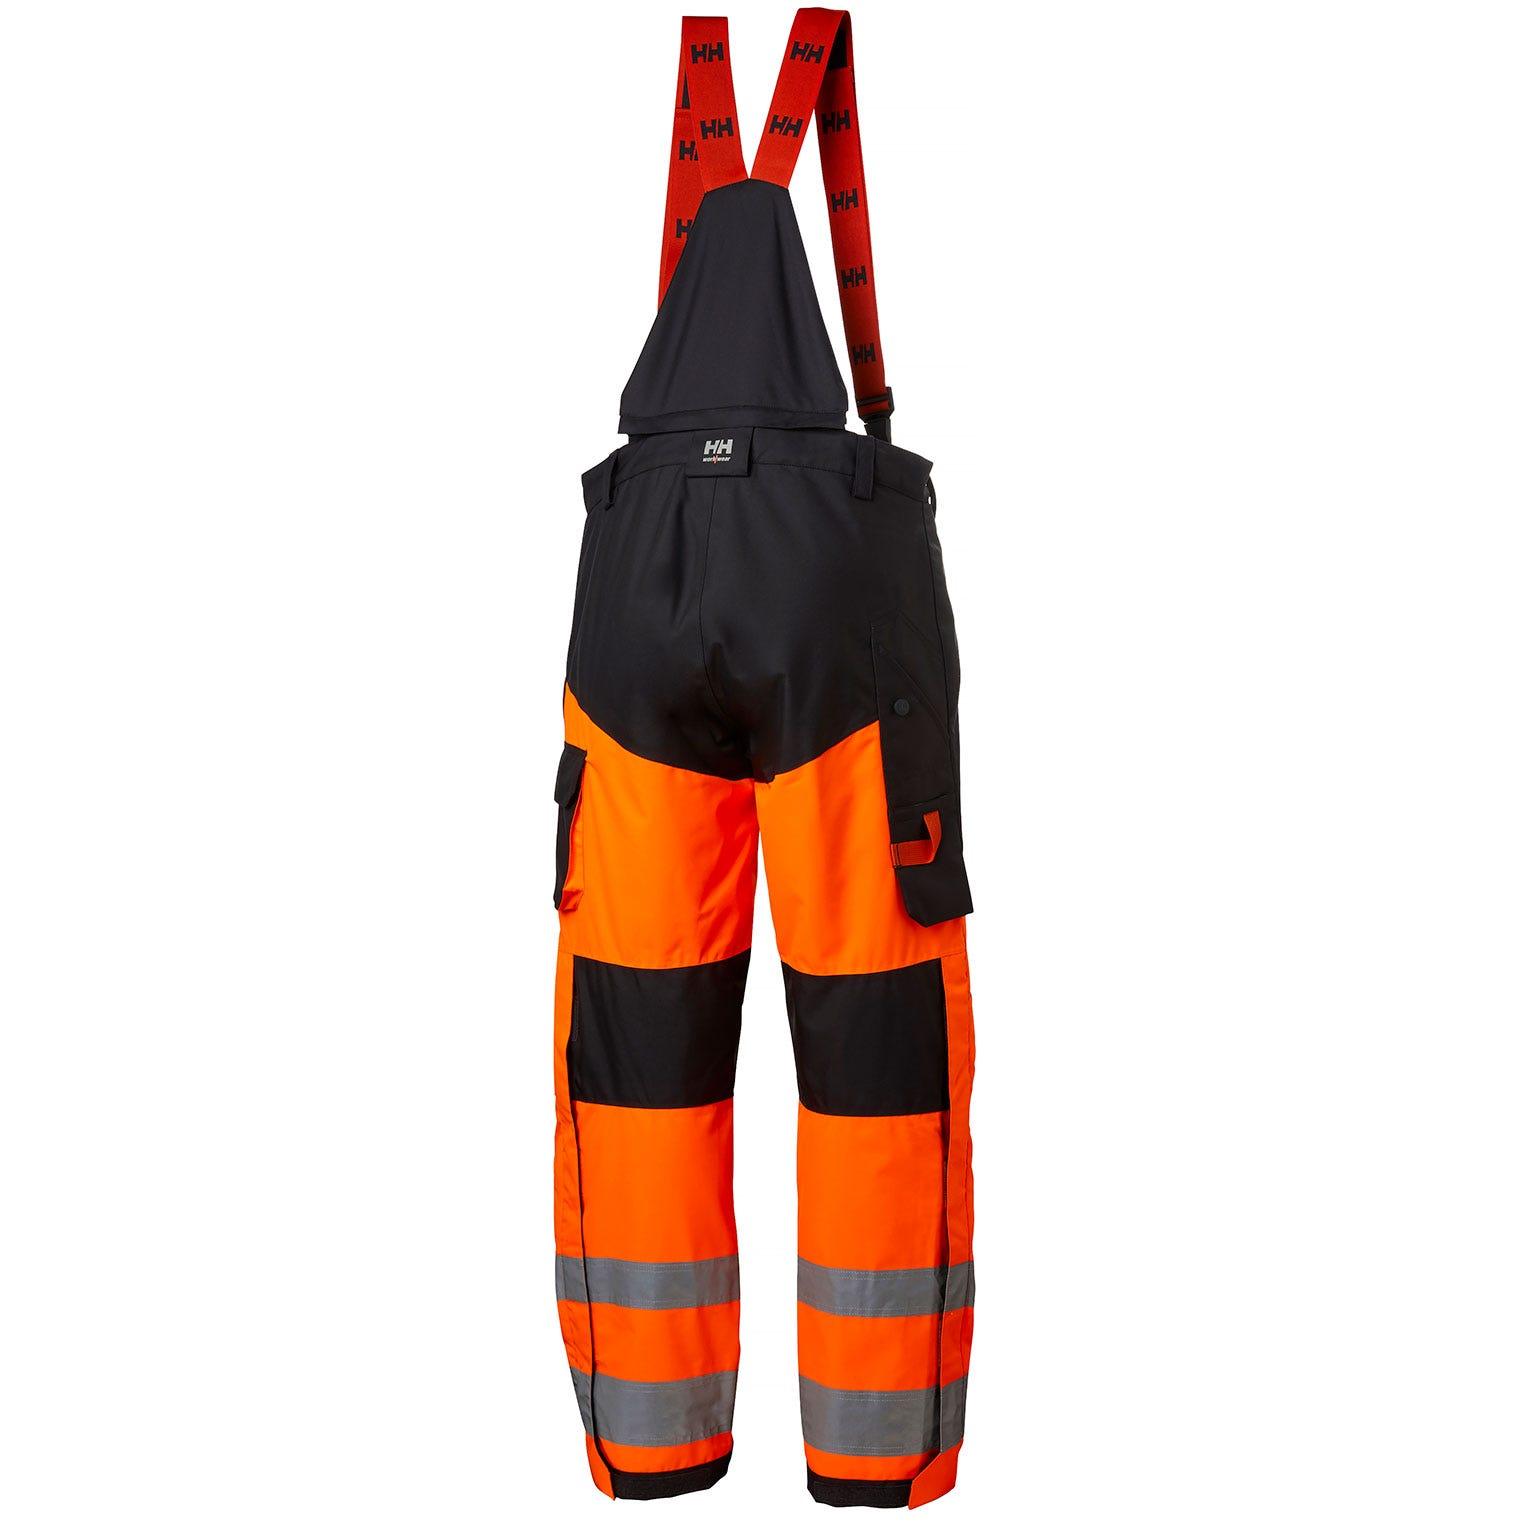 Helly Hansen Winterbroeken Alna 71494 High Vis fluo oranje-ebbenhout(269)